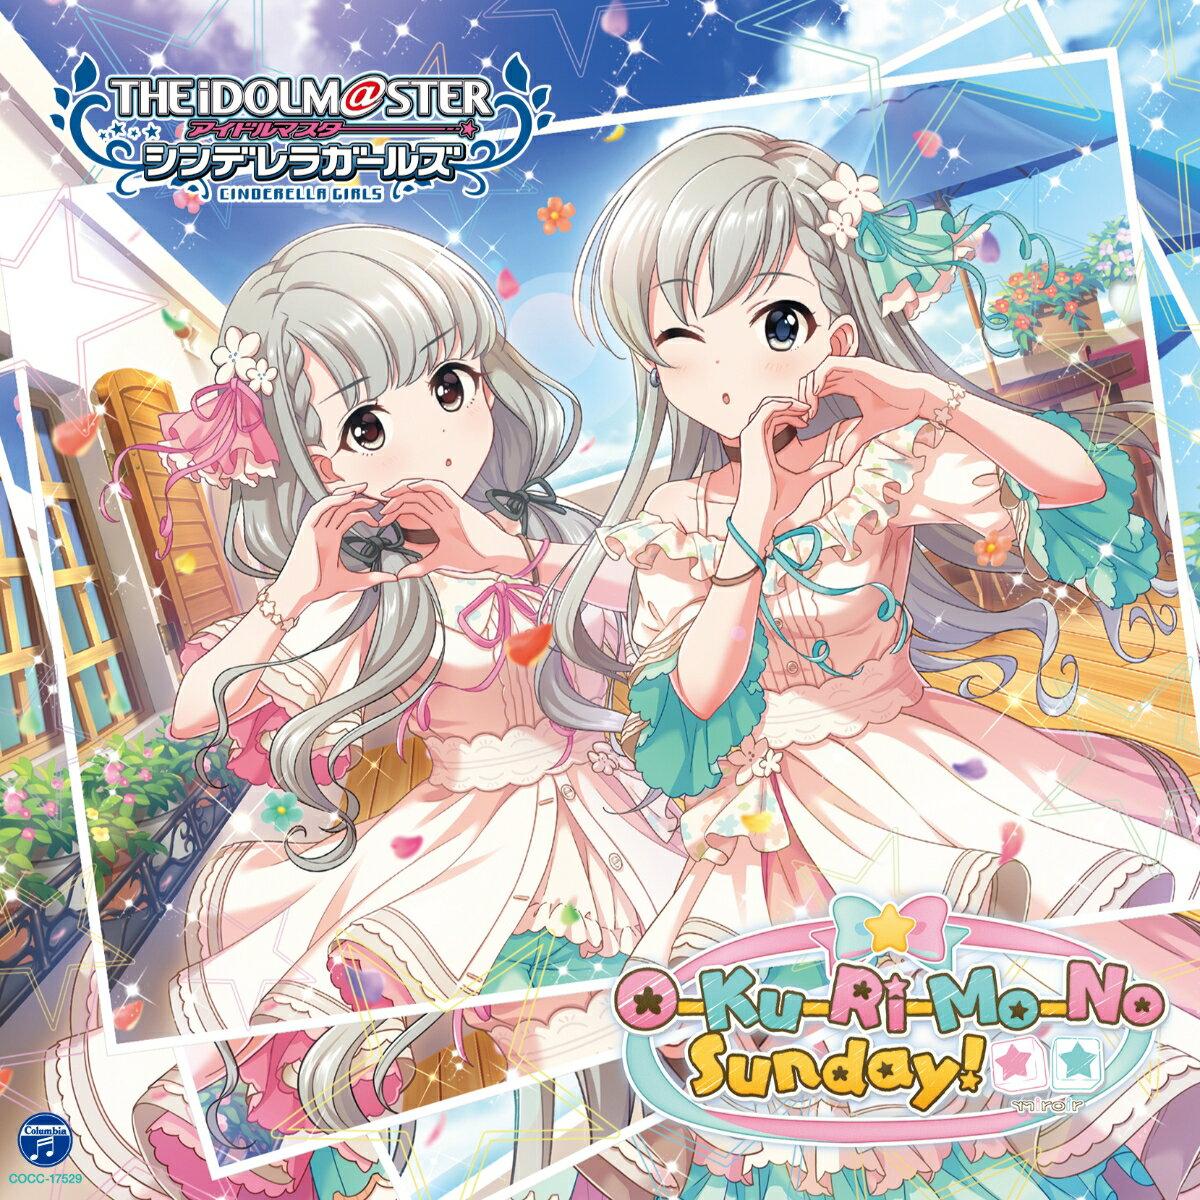 CD, ゲームミュージック THE IDOLMSTER CINDERELLA GIRLS STARLIGHT MASTER 39 O-Ku-Ri-Mo-No Sunday! ()